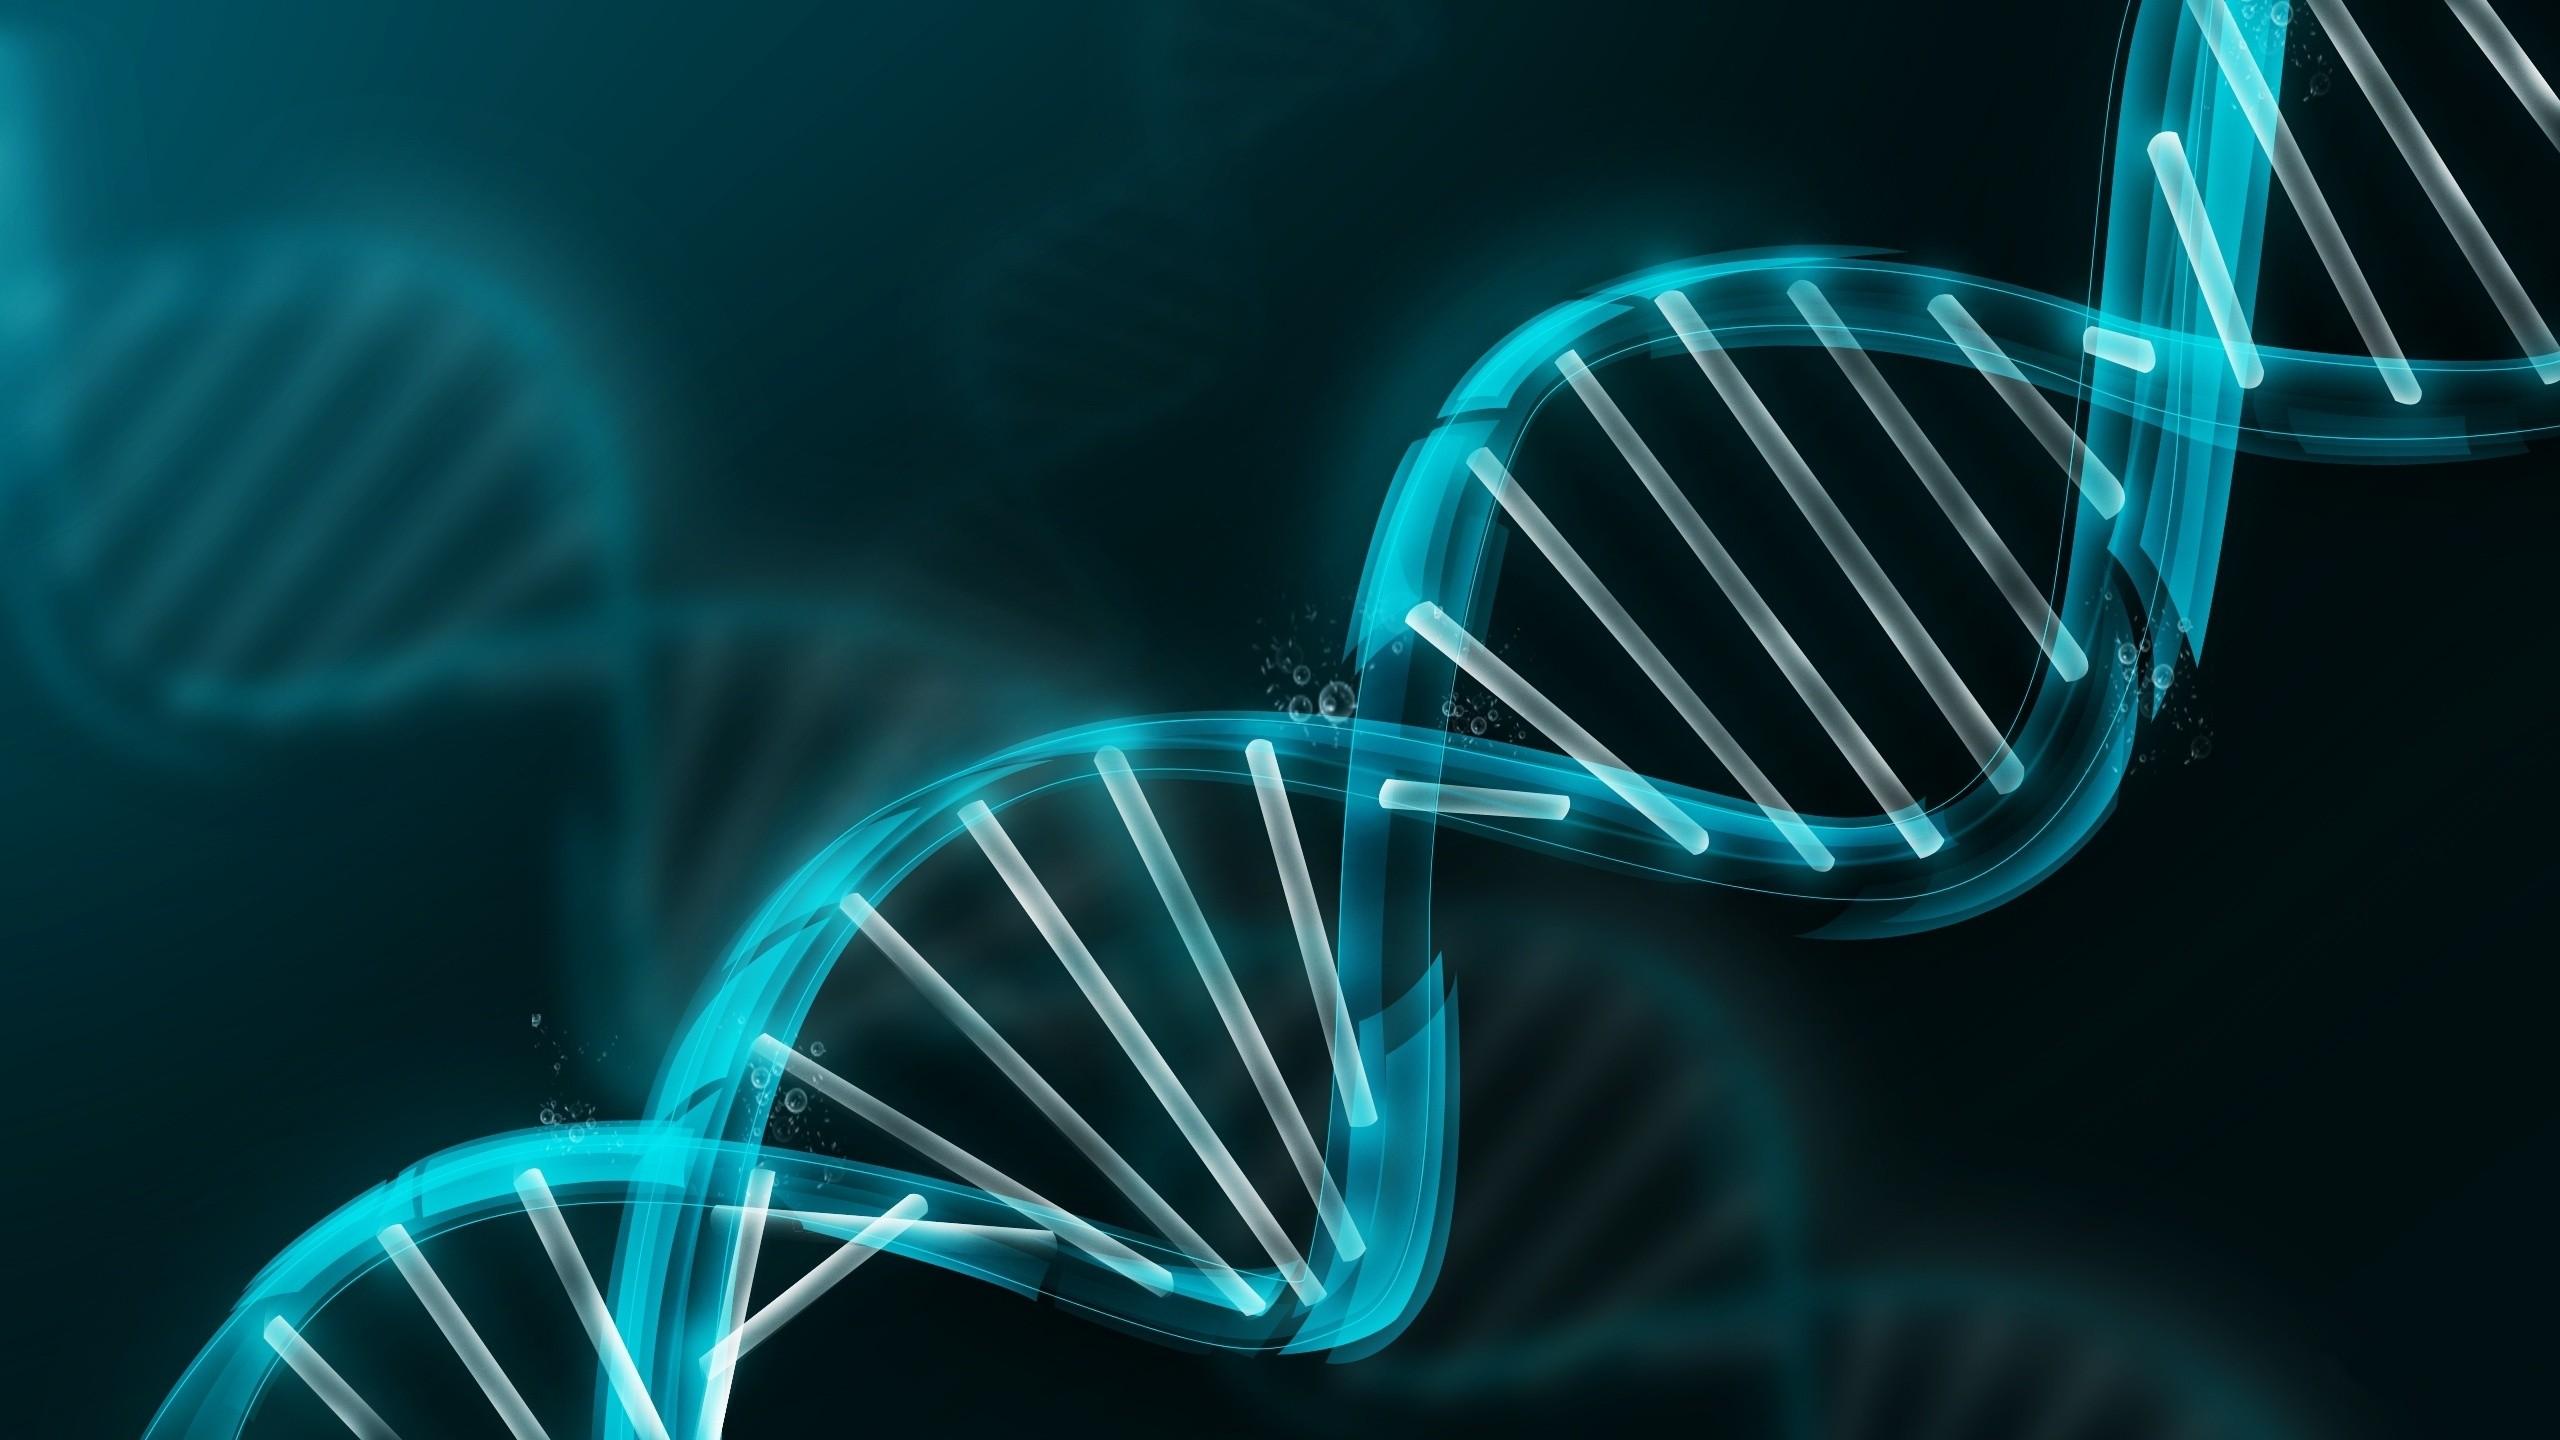 Bio Science: DNA HD Wallpaper